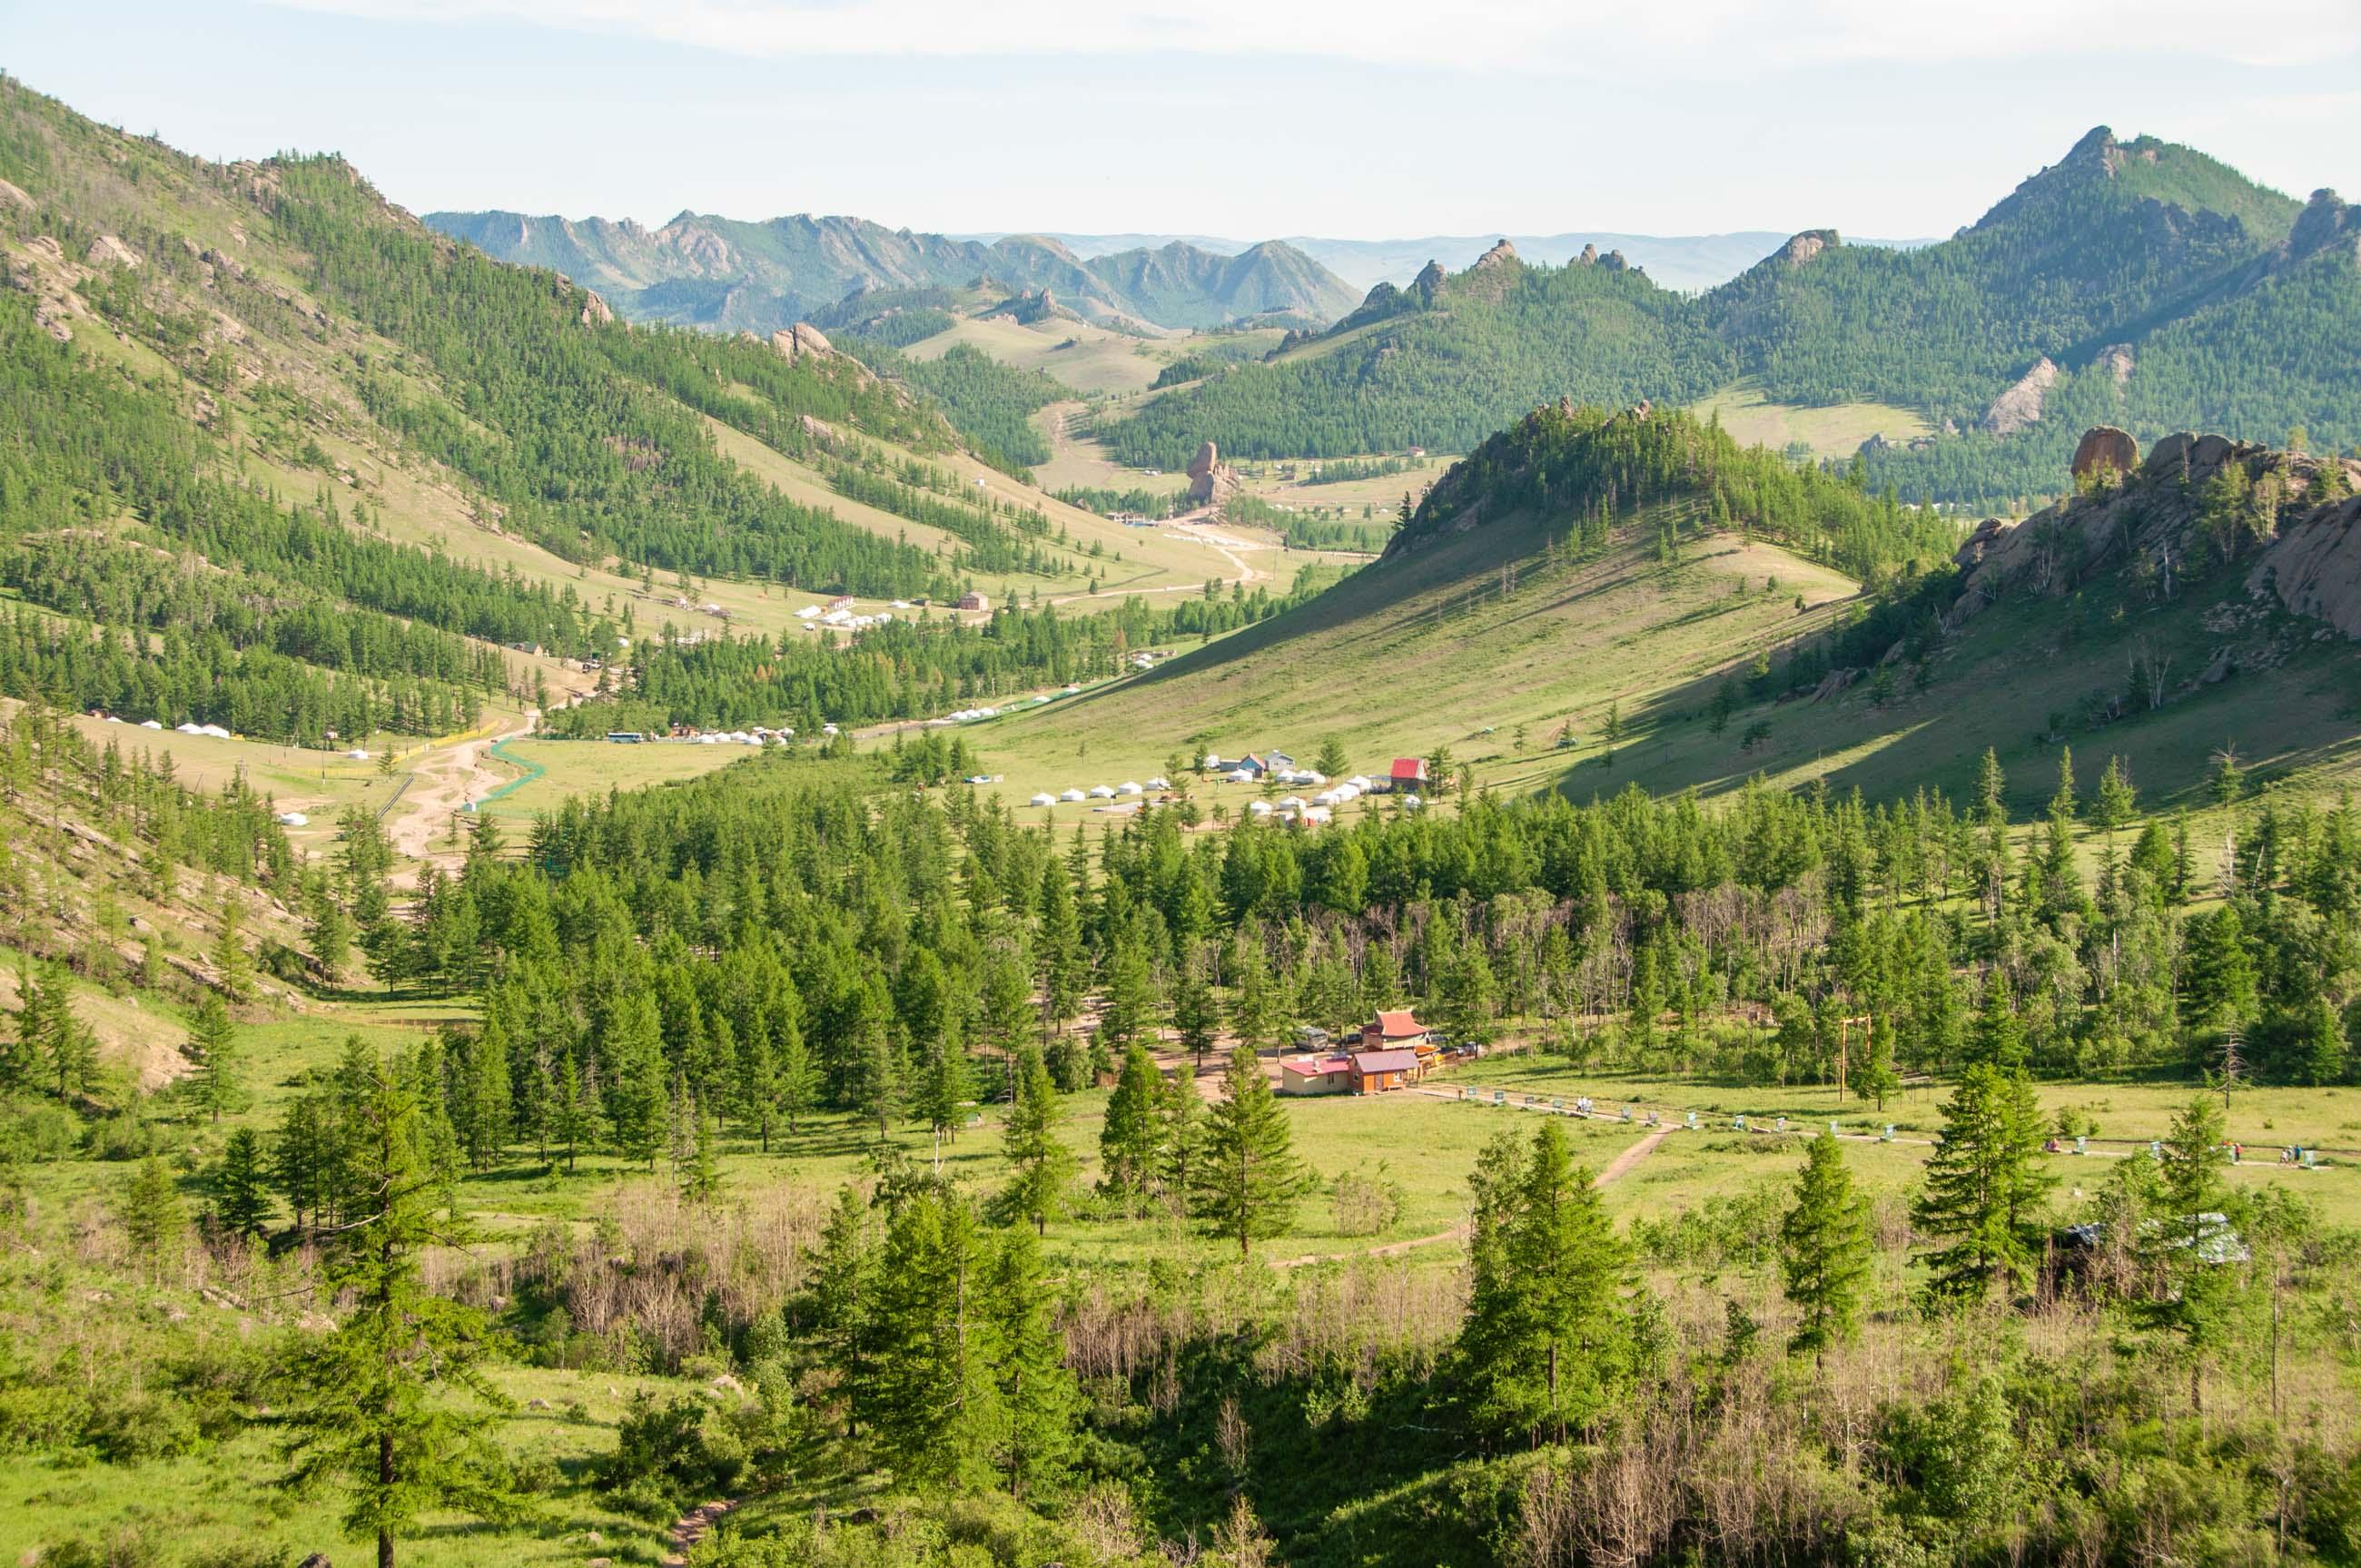 https://bubo.sk/uploads/galleries/4924/tomaskubus_mongolsko_terelj_narodny_park_vyhlad1_transsib.jpg